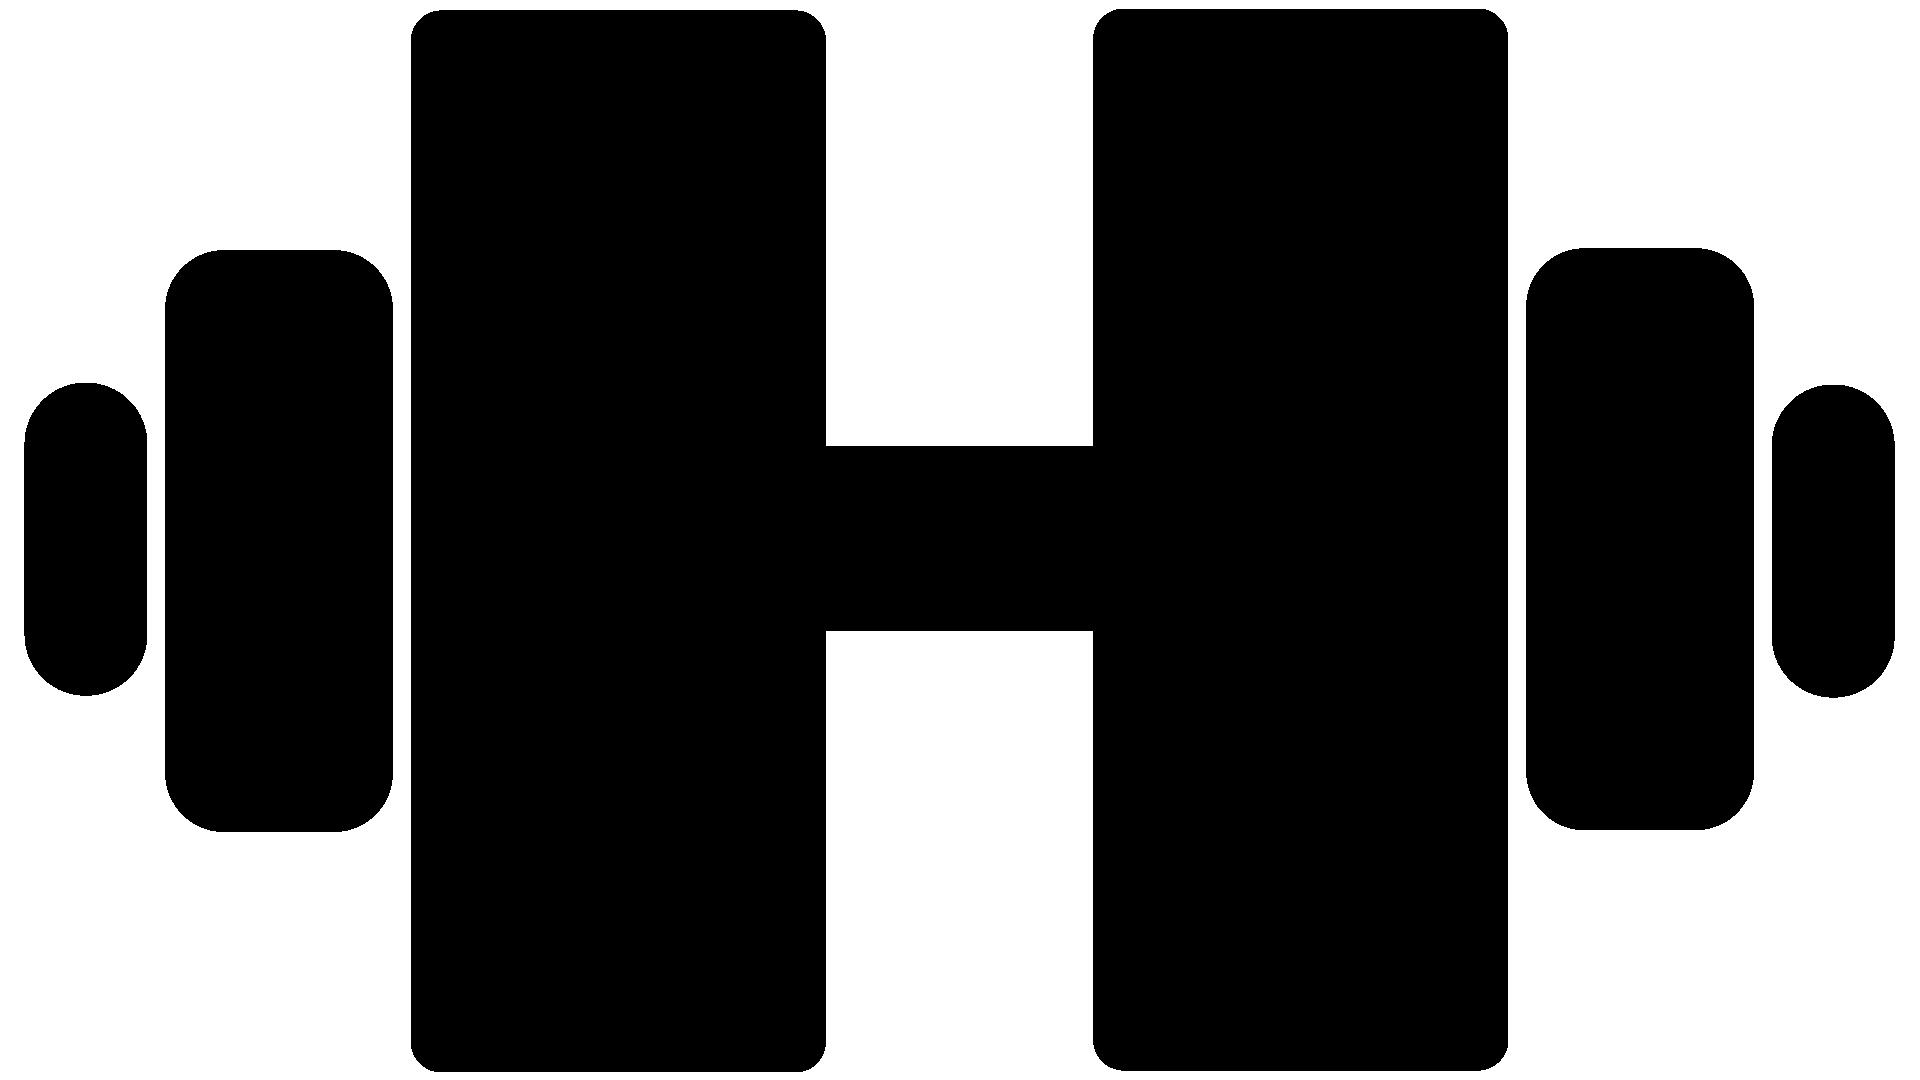 Badbef5c57